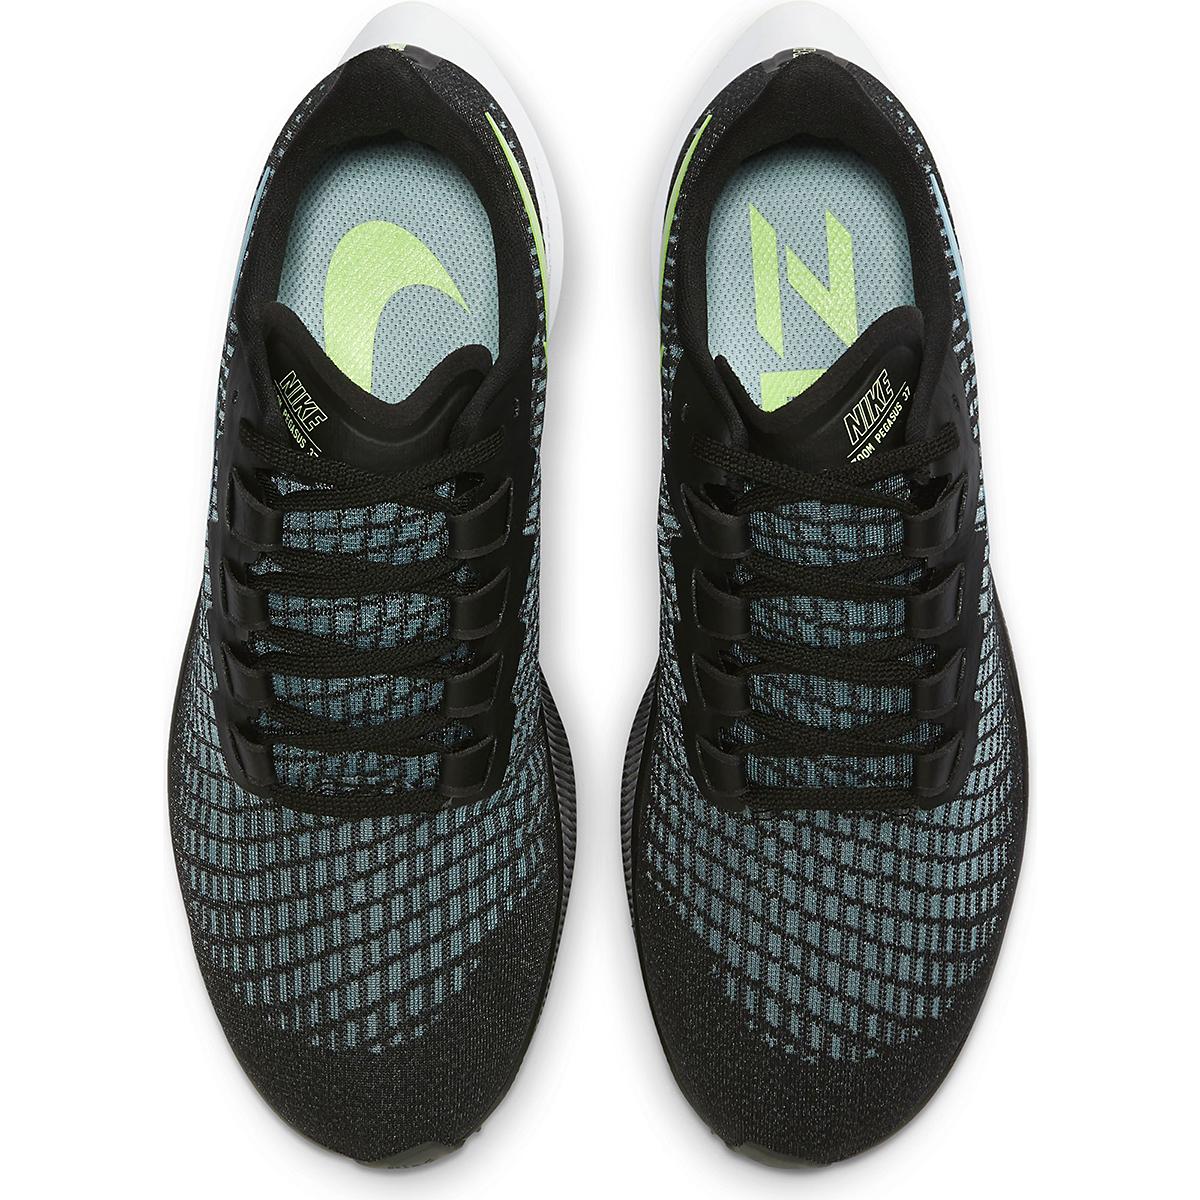 Women's Nike Air Zoom Pegasus 37 Running Shoe - Color: Black/Glacier Ice-Barely Volt-White - Size: 6 - Width: Regular, Black/Glacier Ice-Barely Volt-White, large, image 4